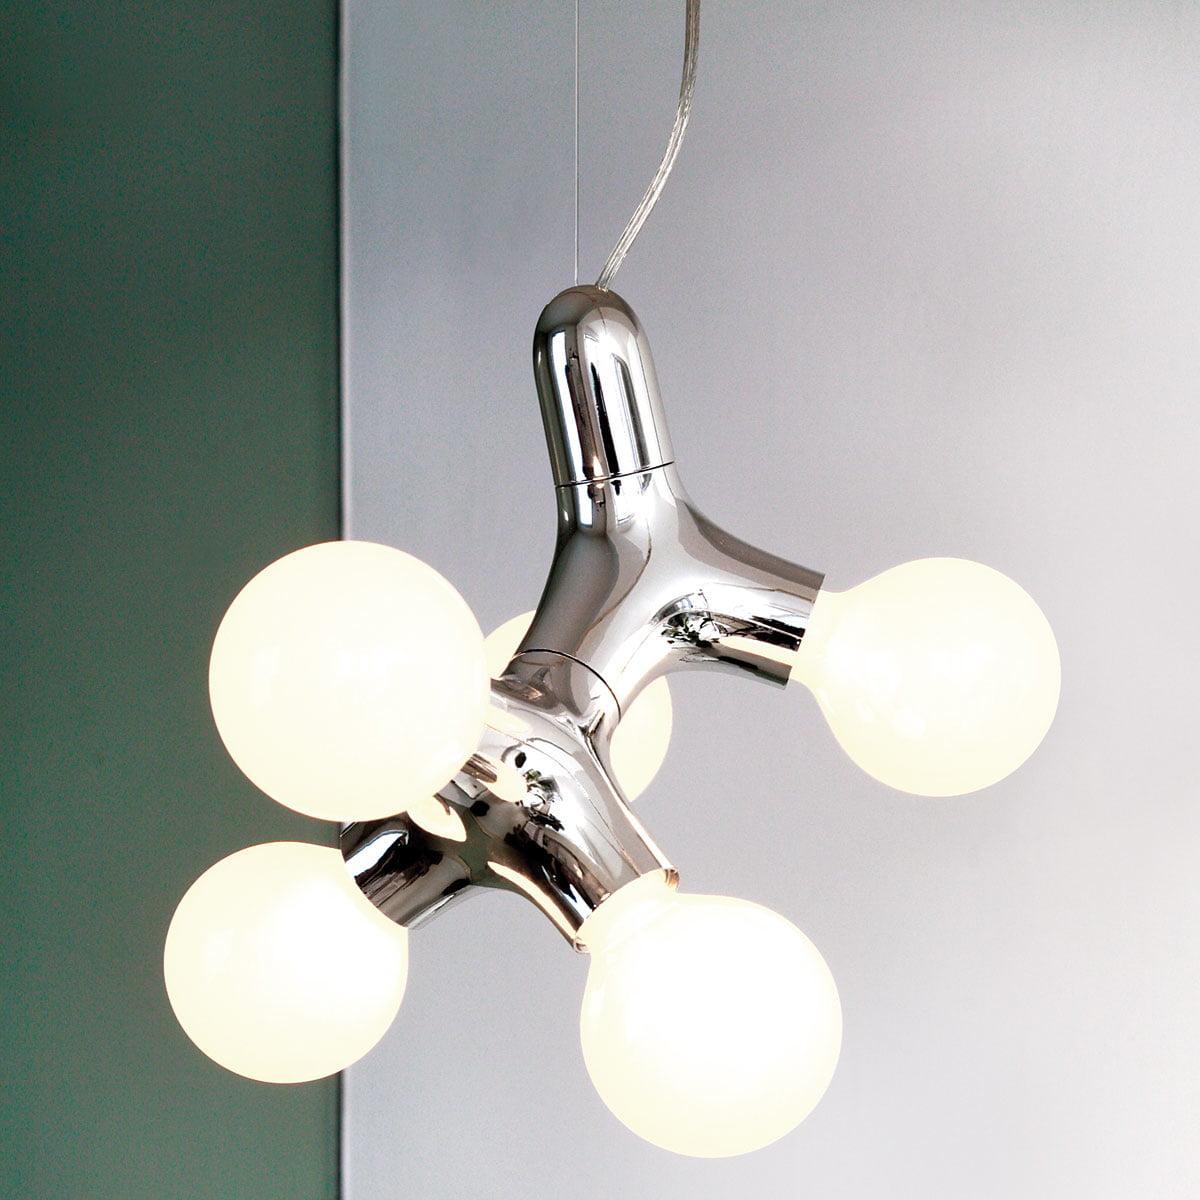 Dna pendant lamp by hopf wortmann for next next dna pendant lamp double chrome mozeypictures Images